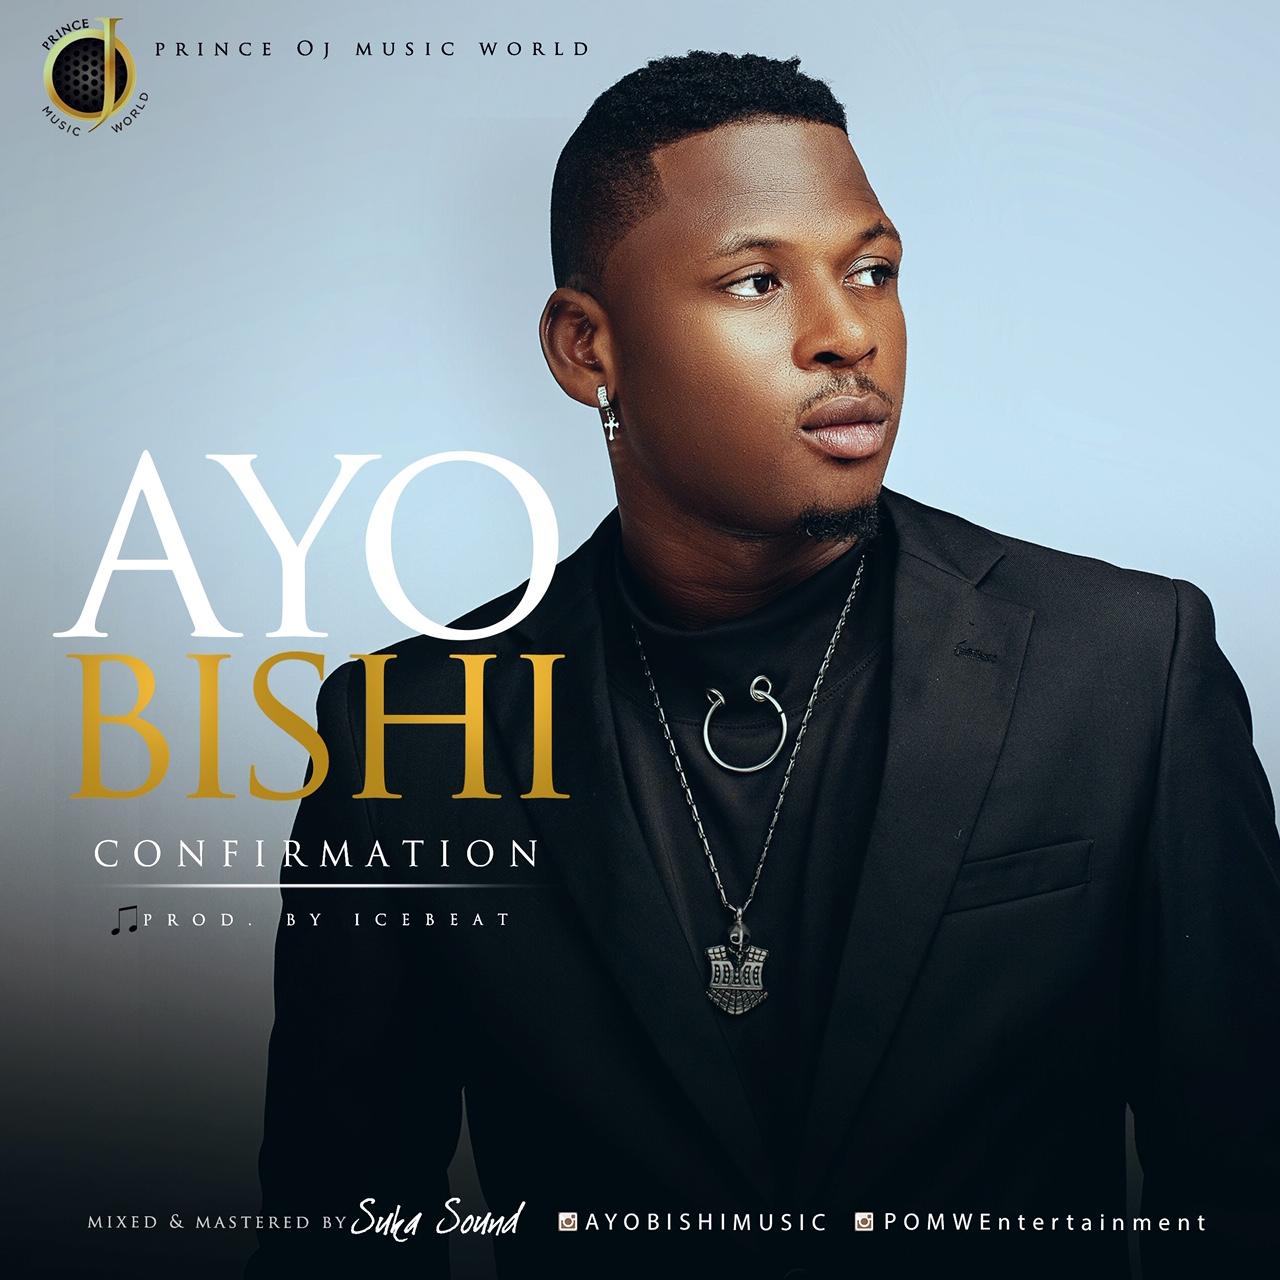 Ayo Bishi – Confirmation